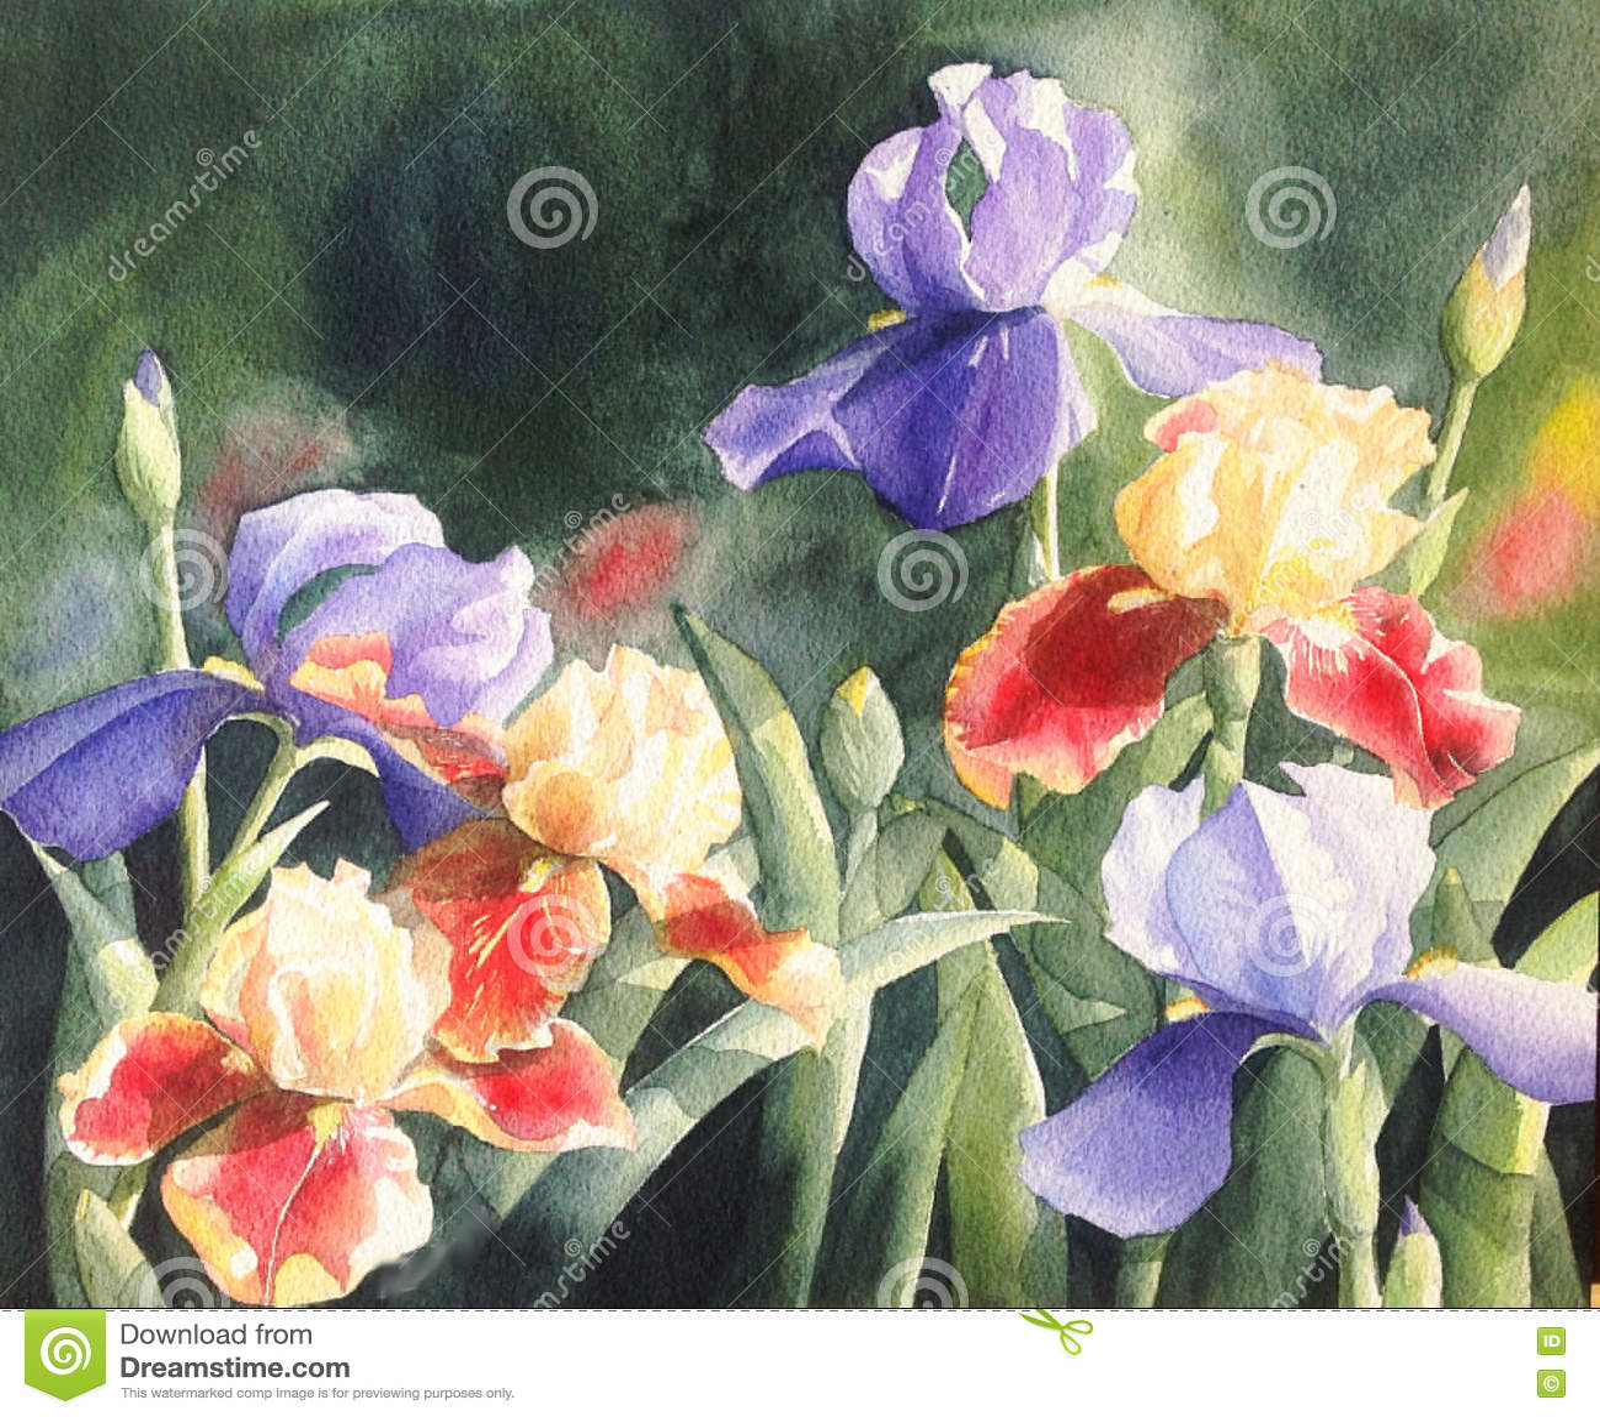 Watercolor painting illustration purple iris flower stock download watercolor painting illustration purple iris flower stock illustration illustration of paint growth izmirmasajfo